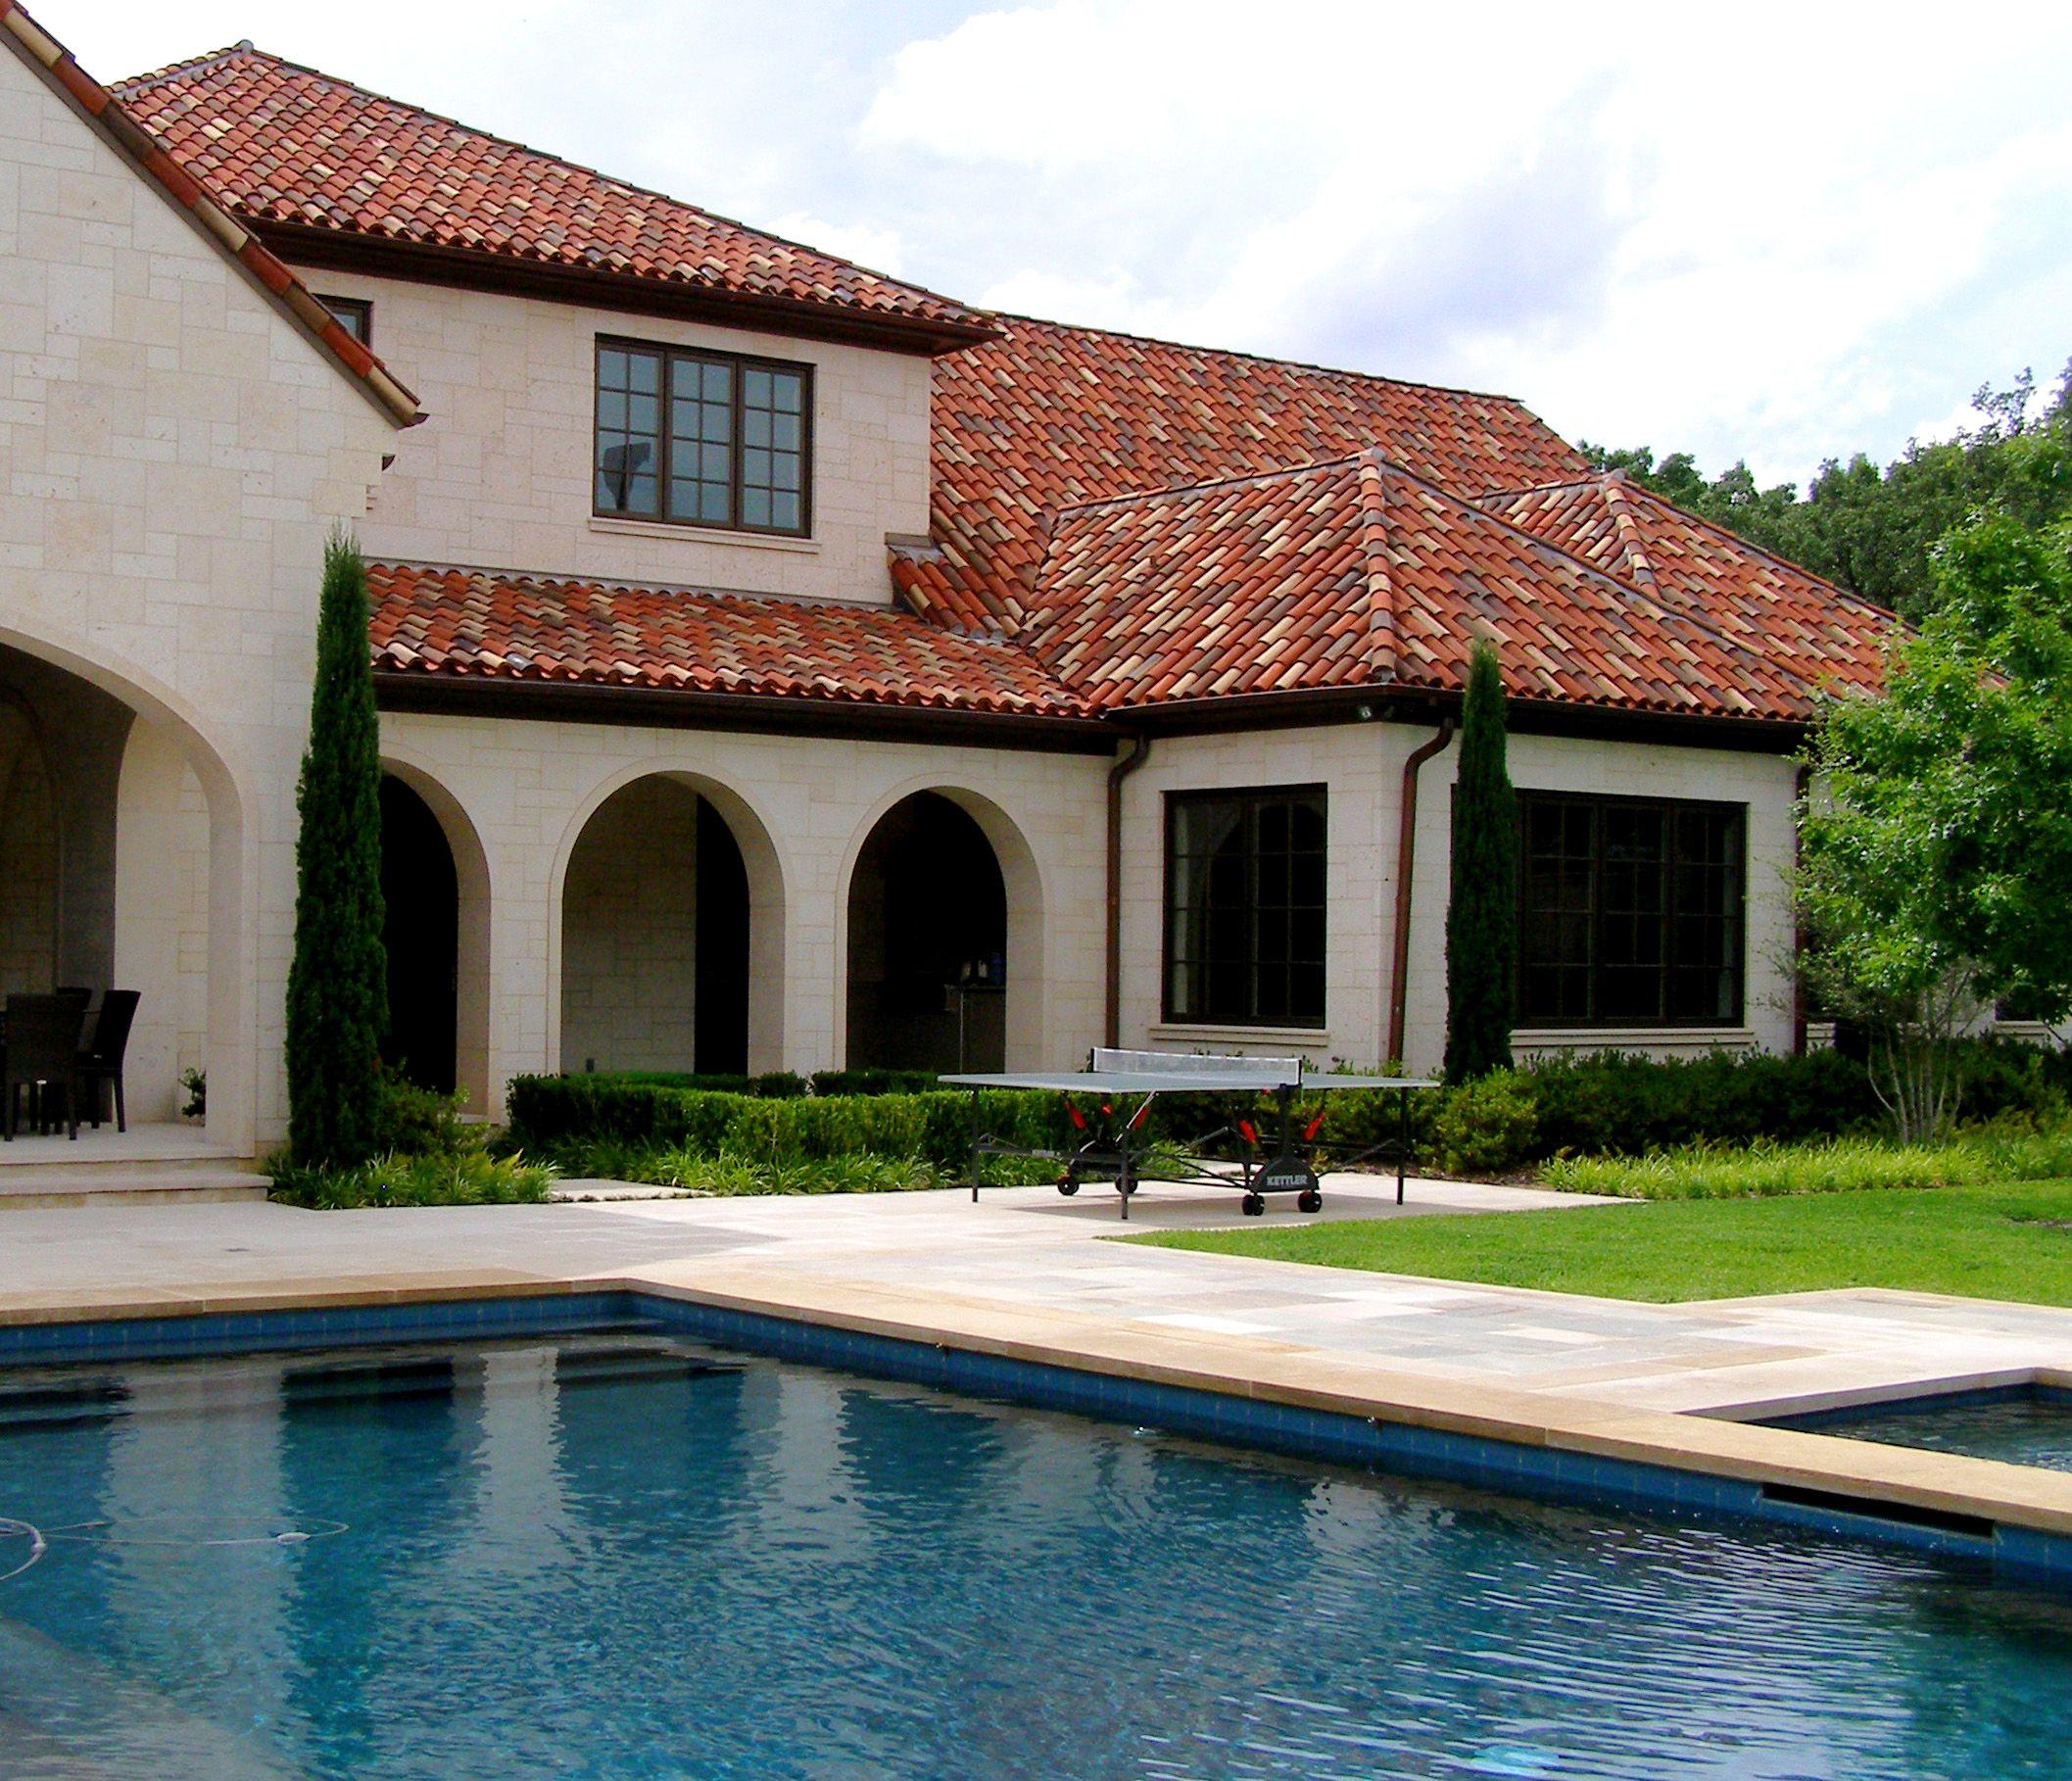 Backyard Exterior of a Italian Mediterranean Villa in Dallas, TX ...